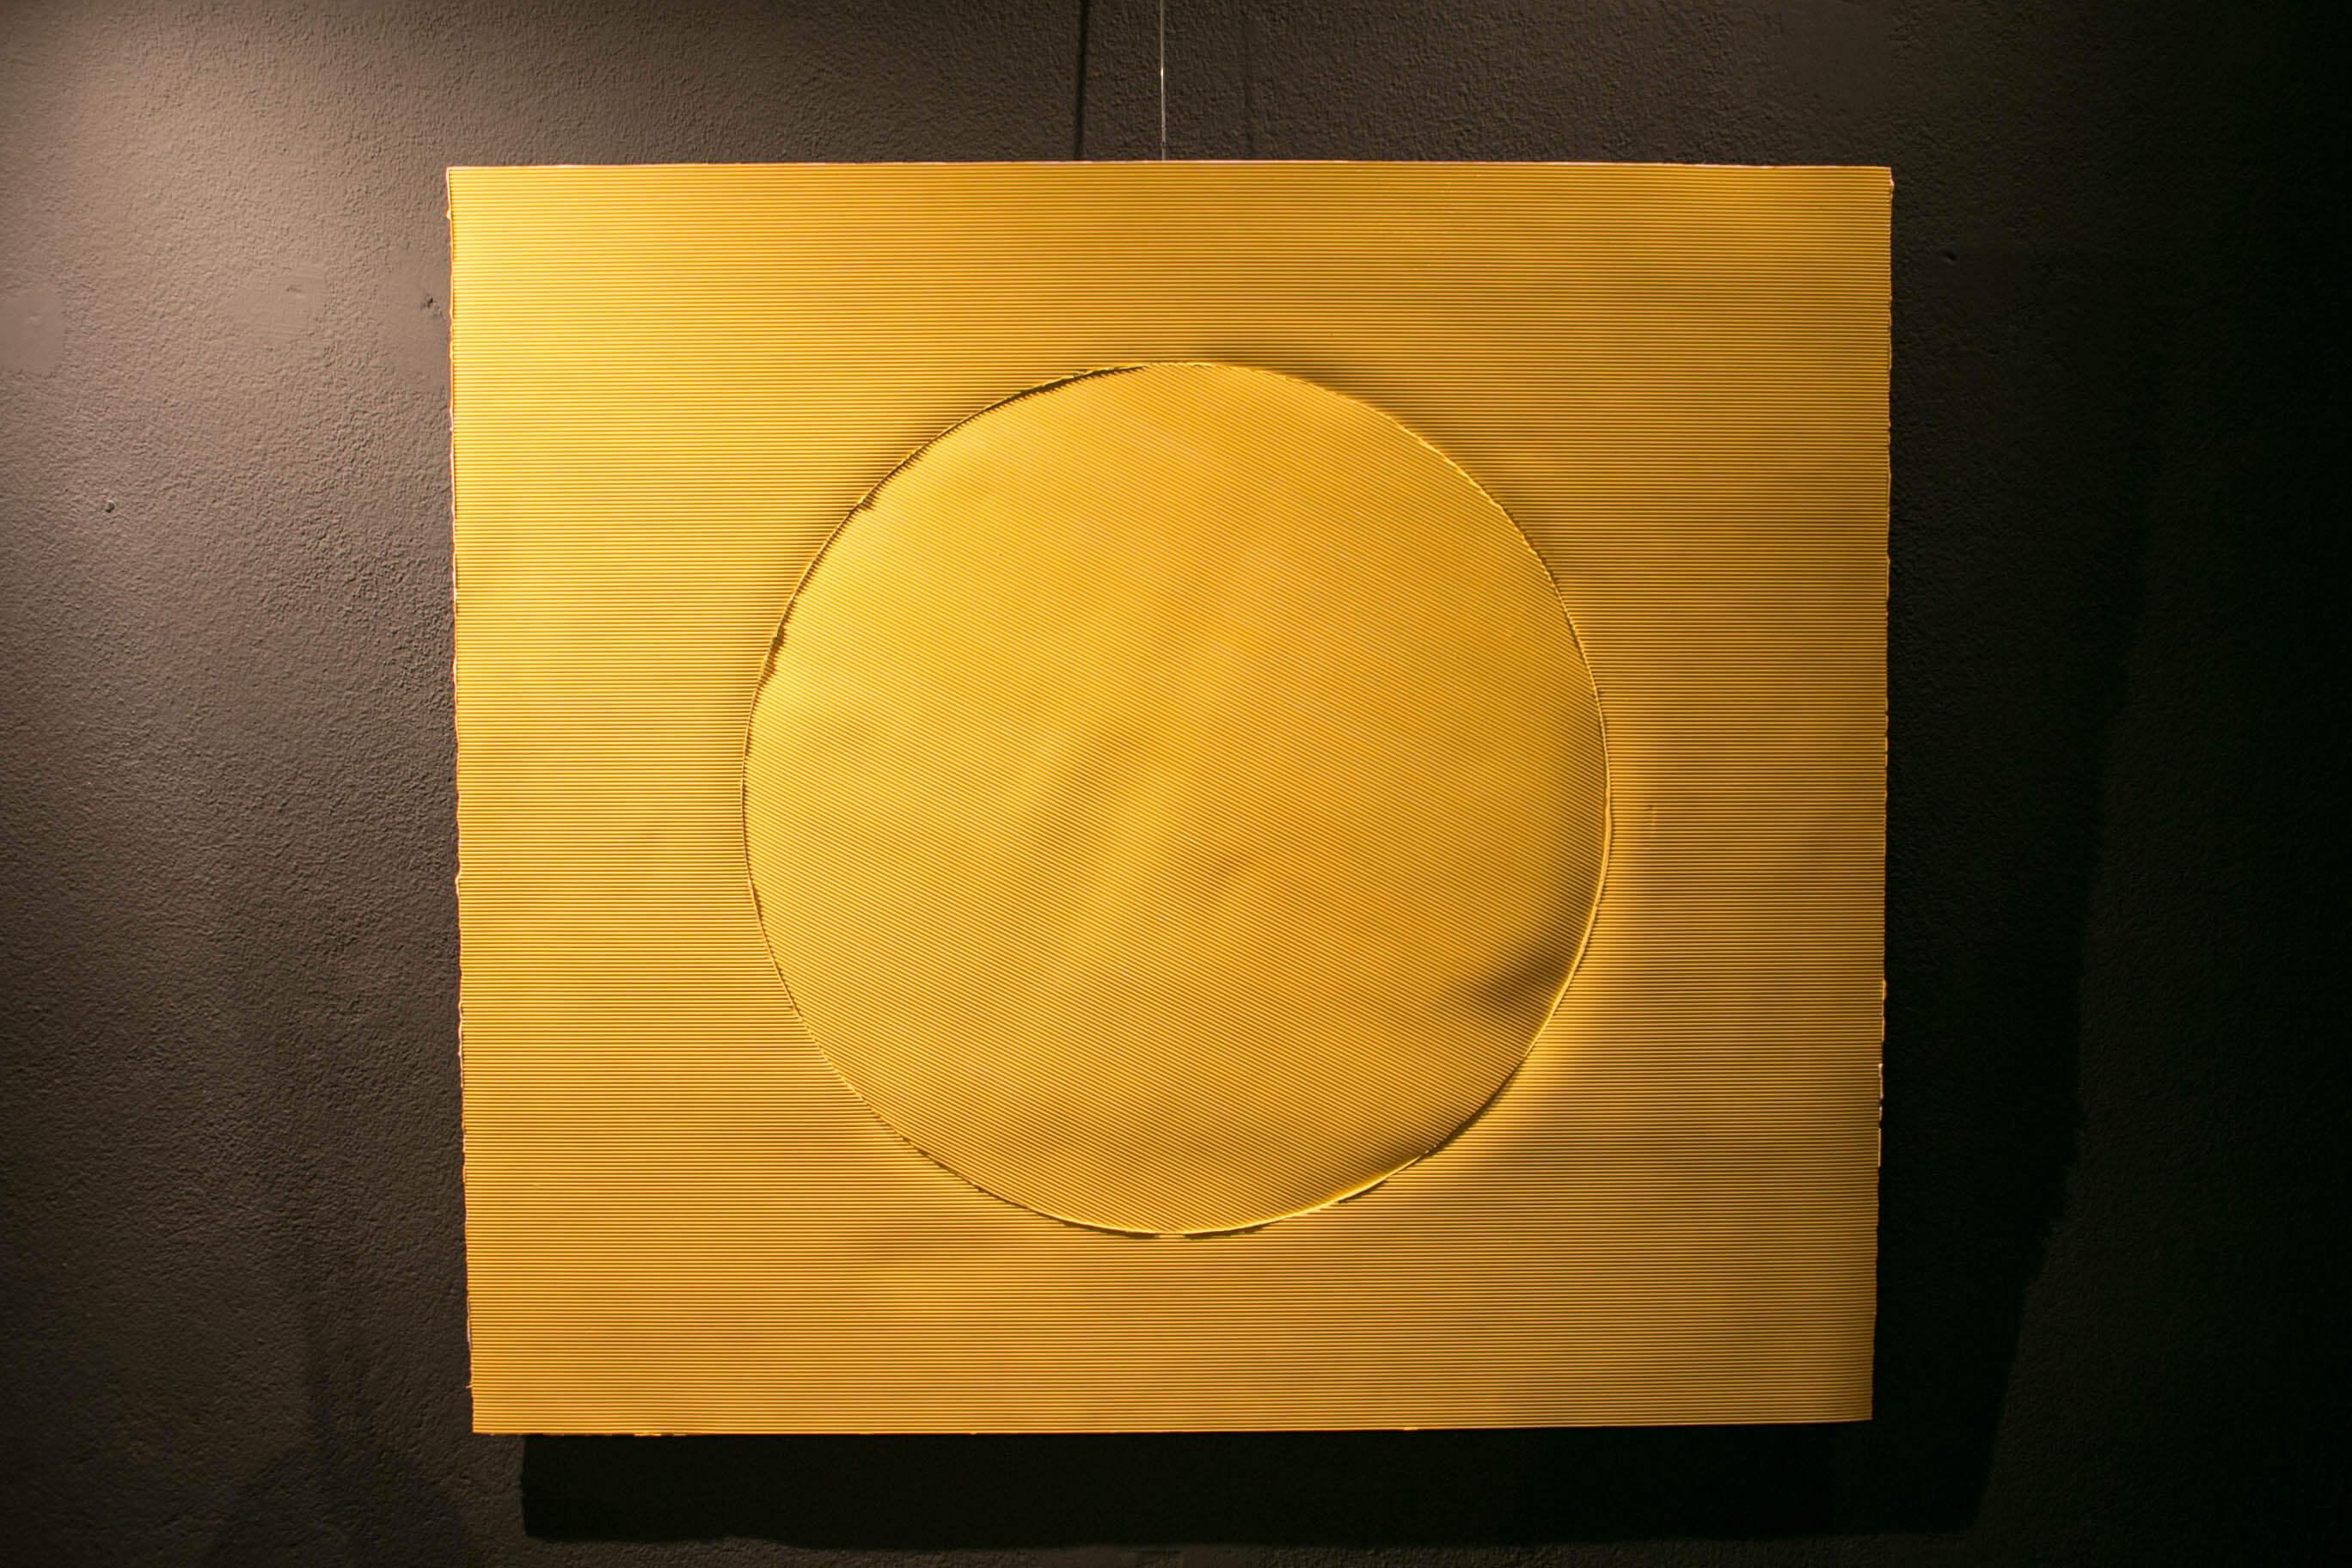 contempory_Meenan_art_relief_sculpture_yellow_IMG_2451.jpg